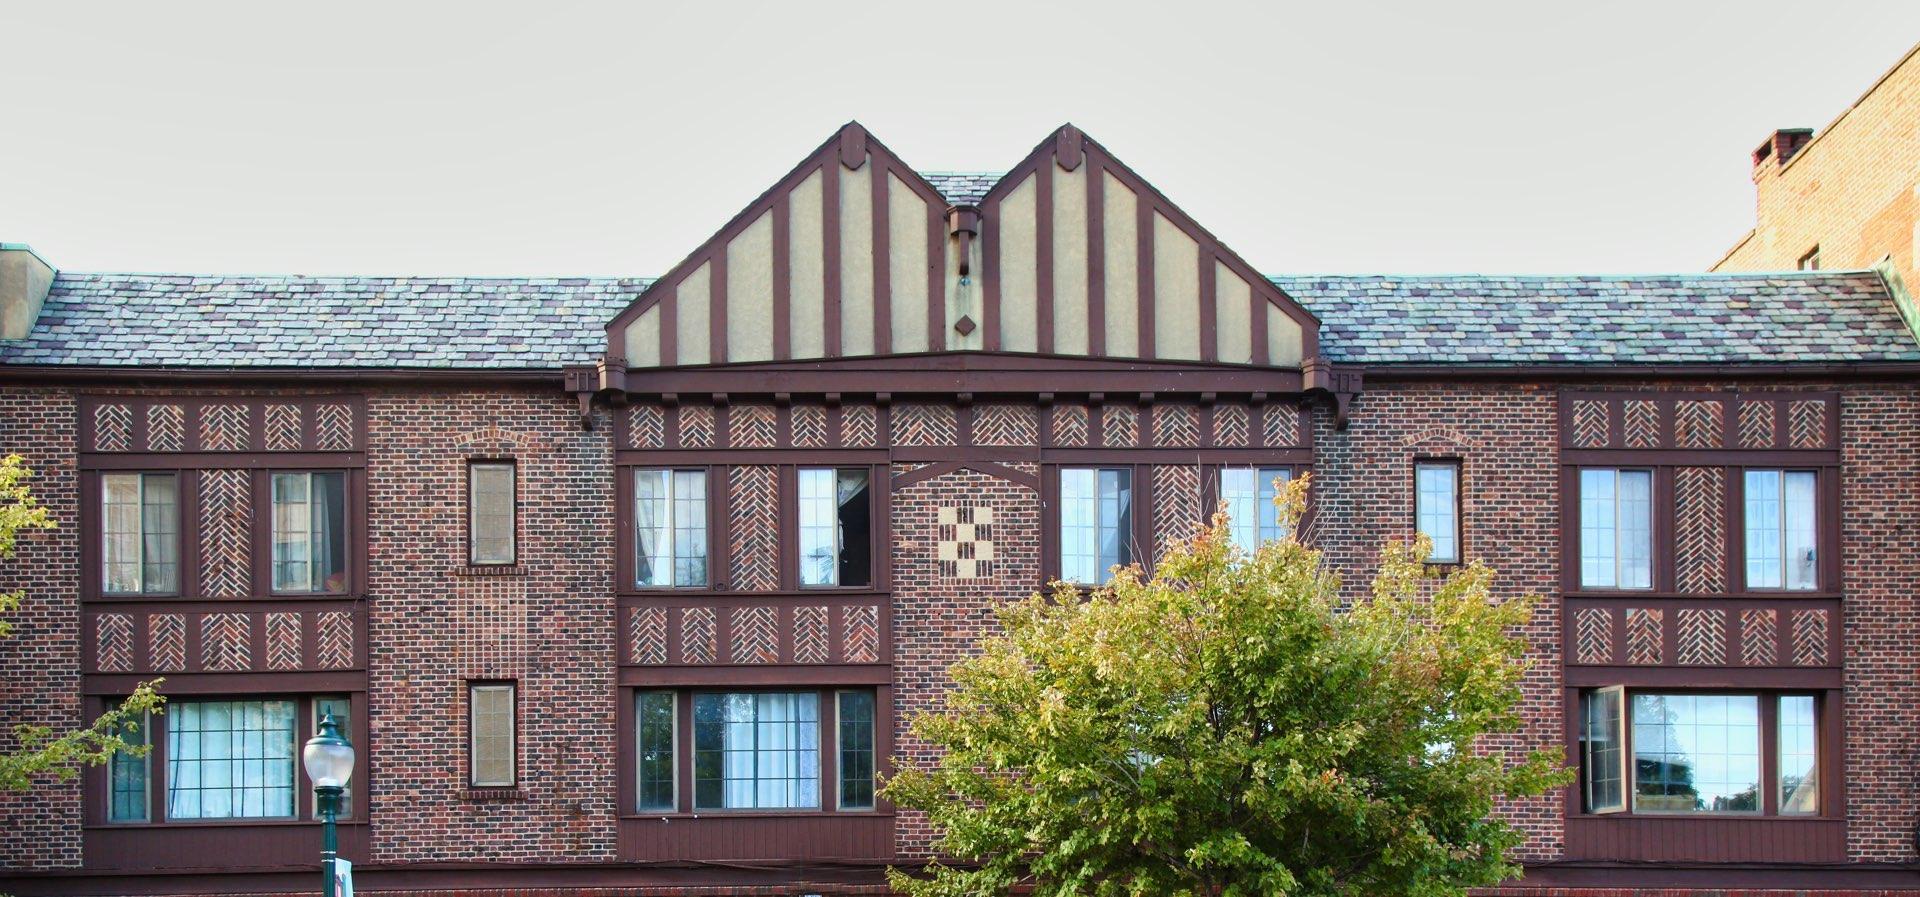 Rooftops Half timbered brickTudor